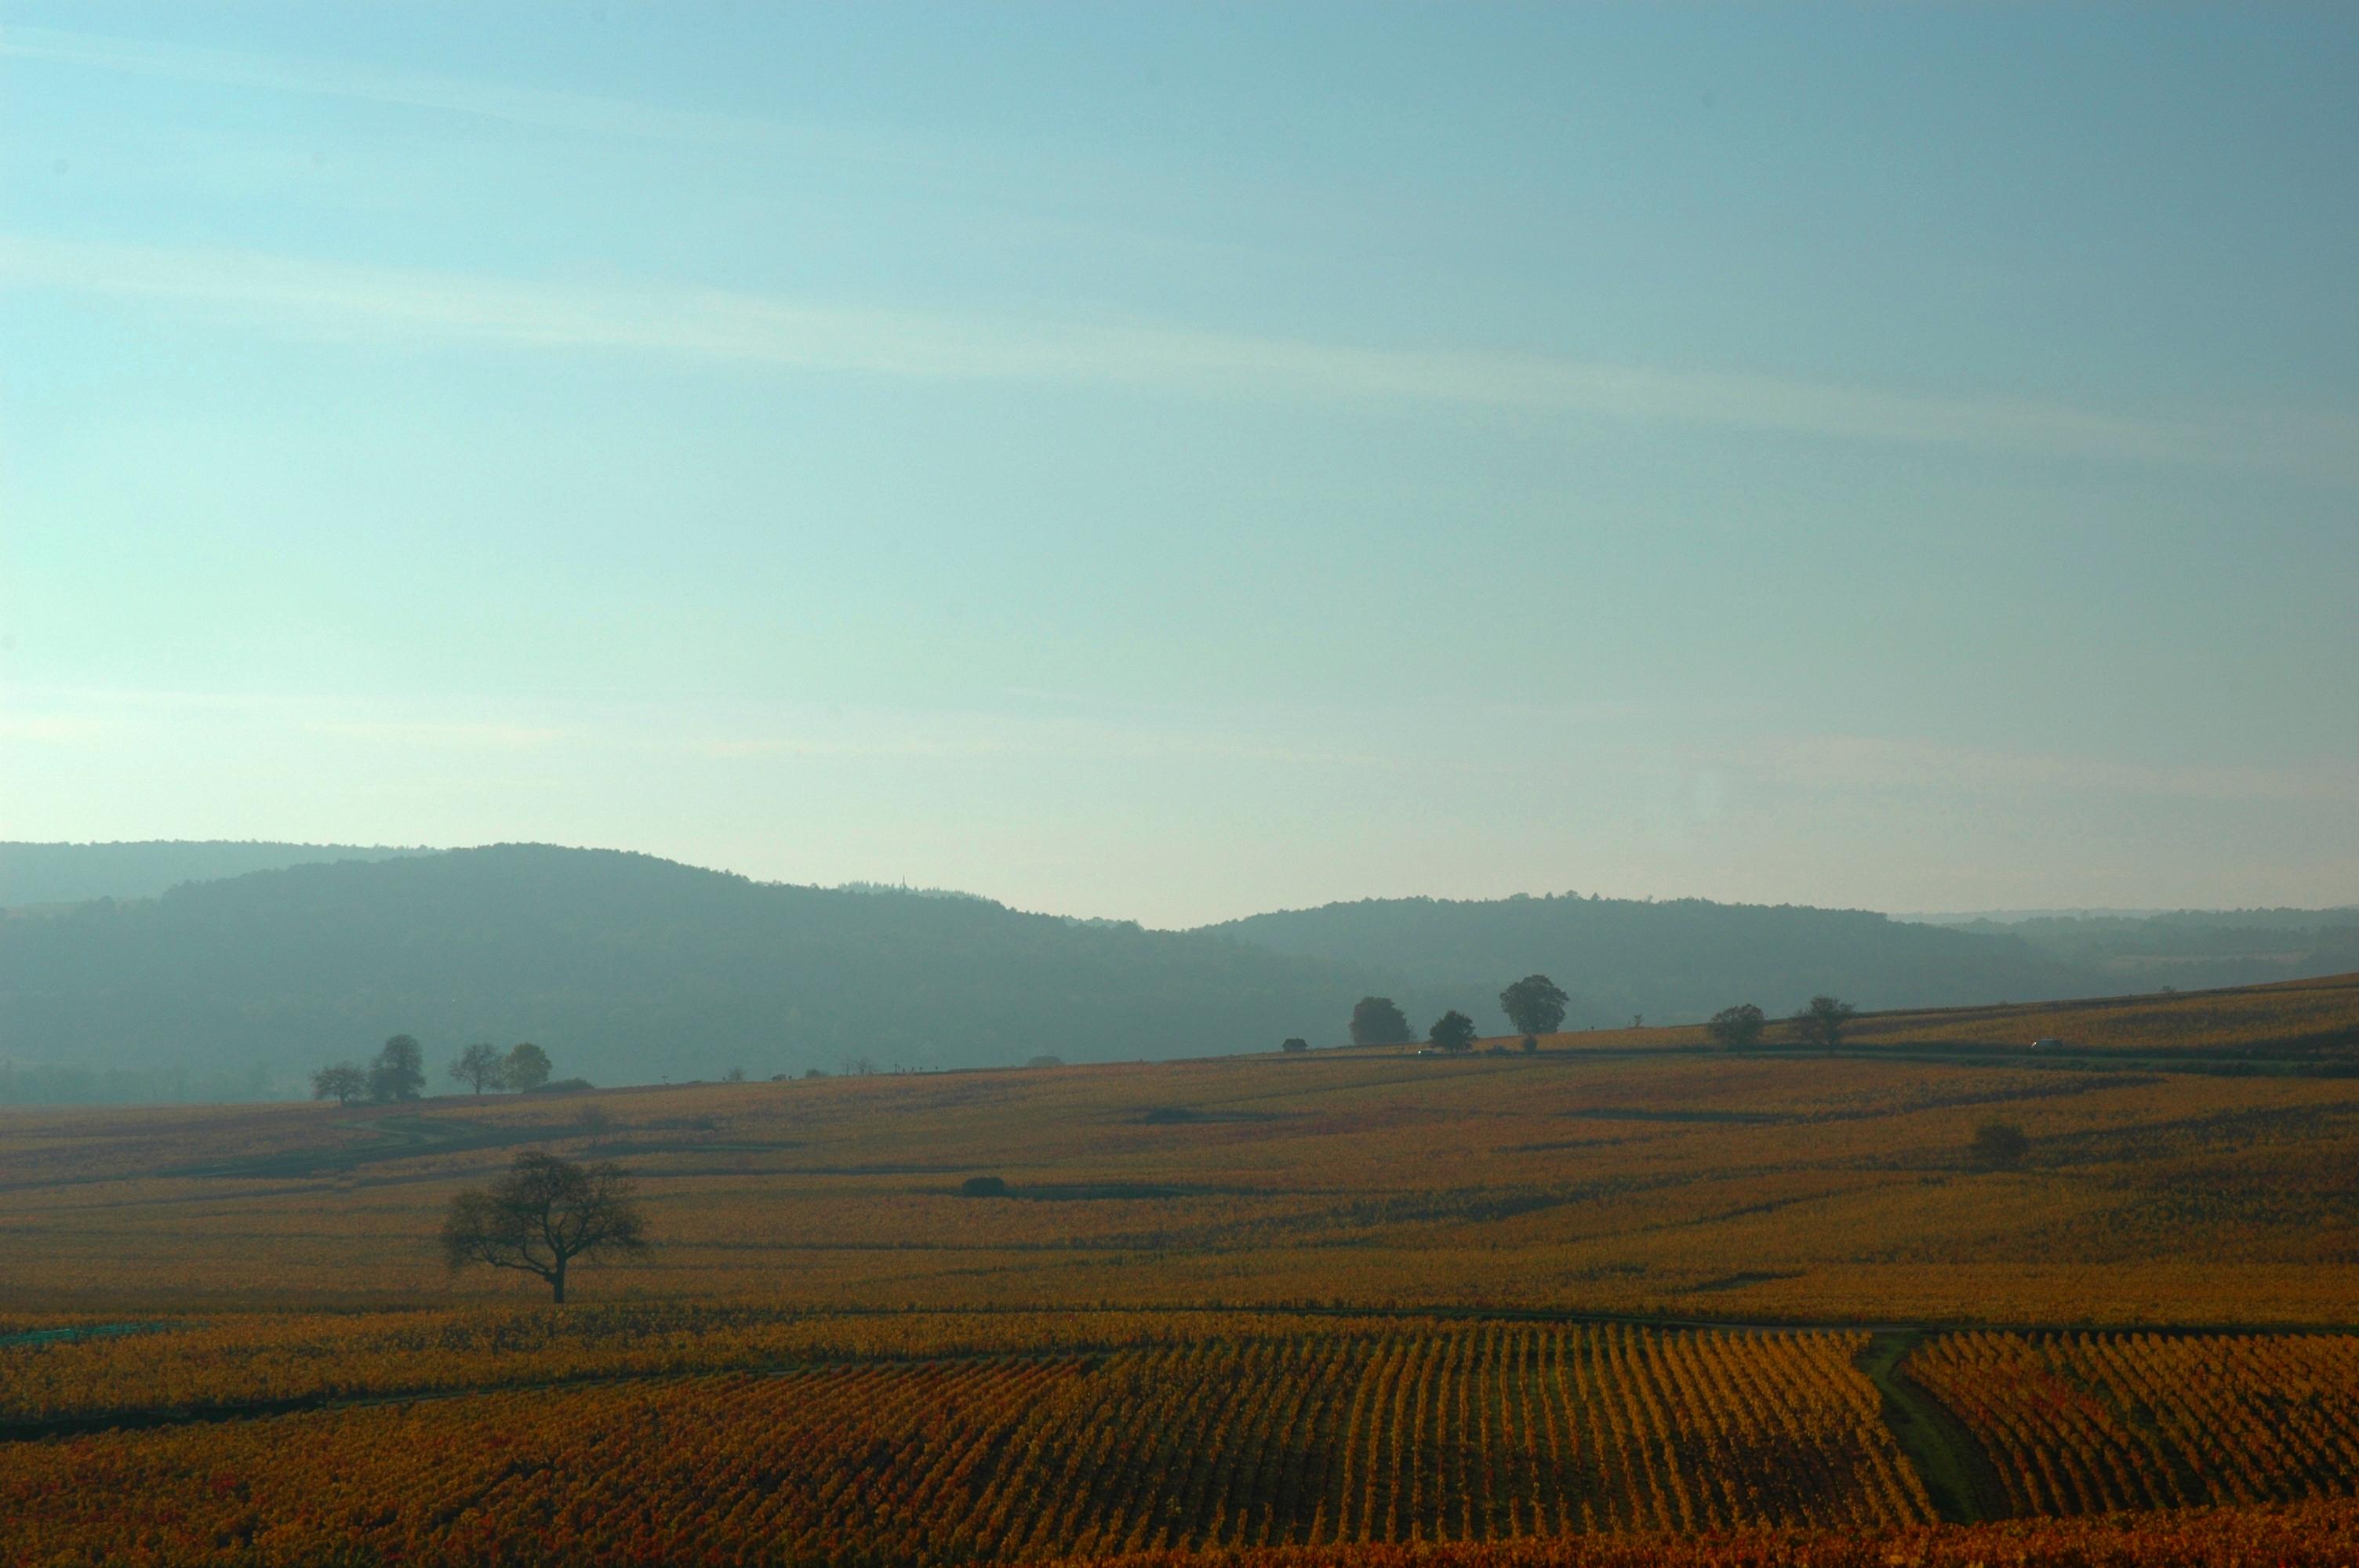 Vignes de Corton proches des Chambres Buissonnieres Ladoix Serrigny route des grands crus (4)